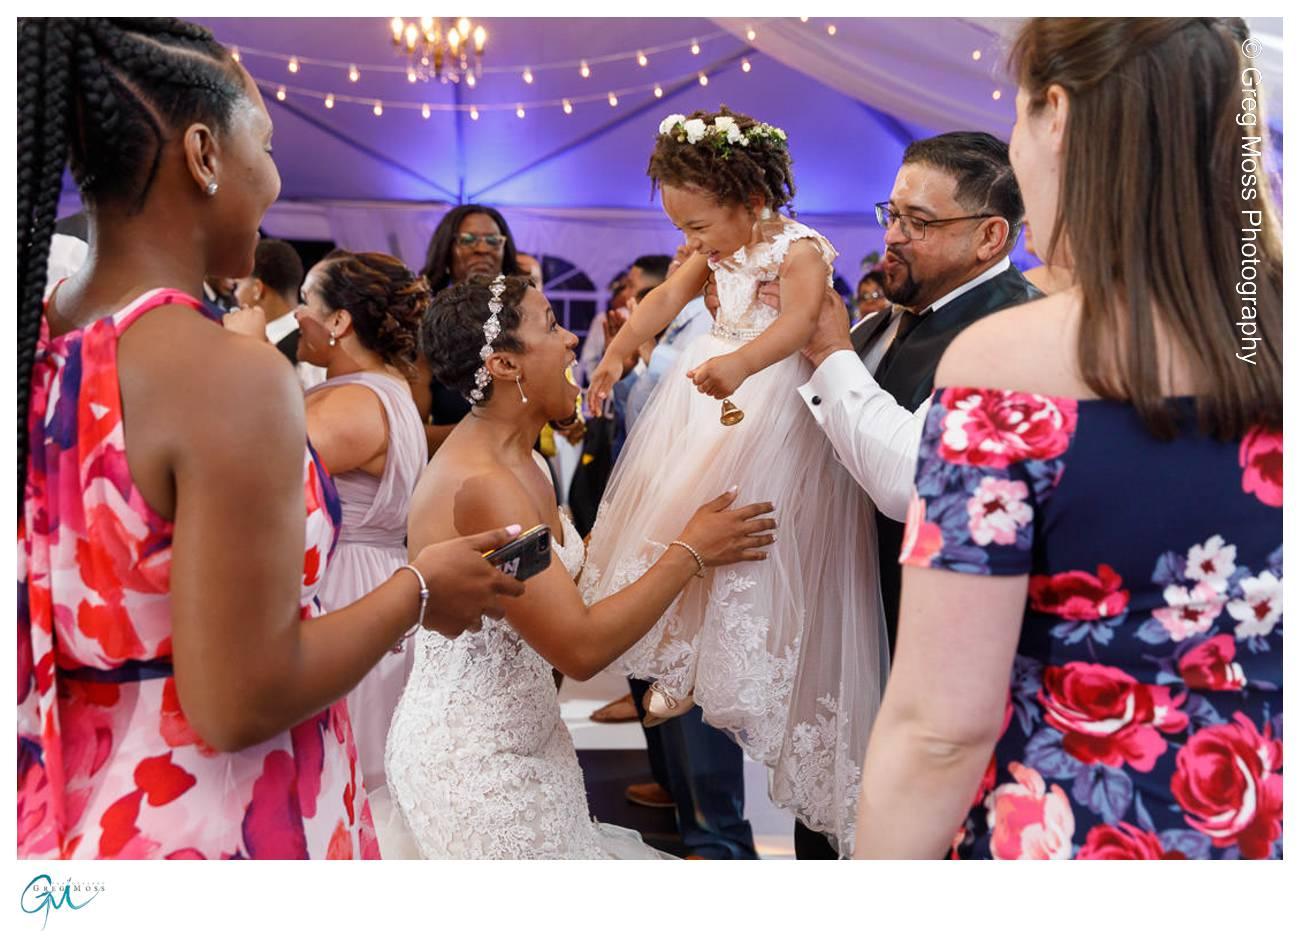 La Notte Wedding